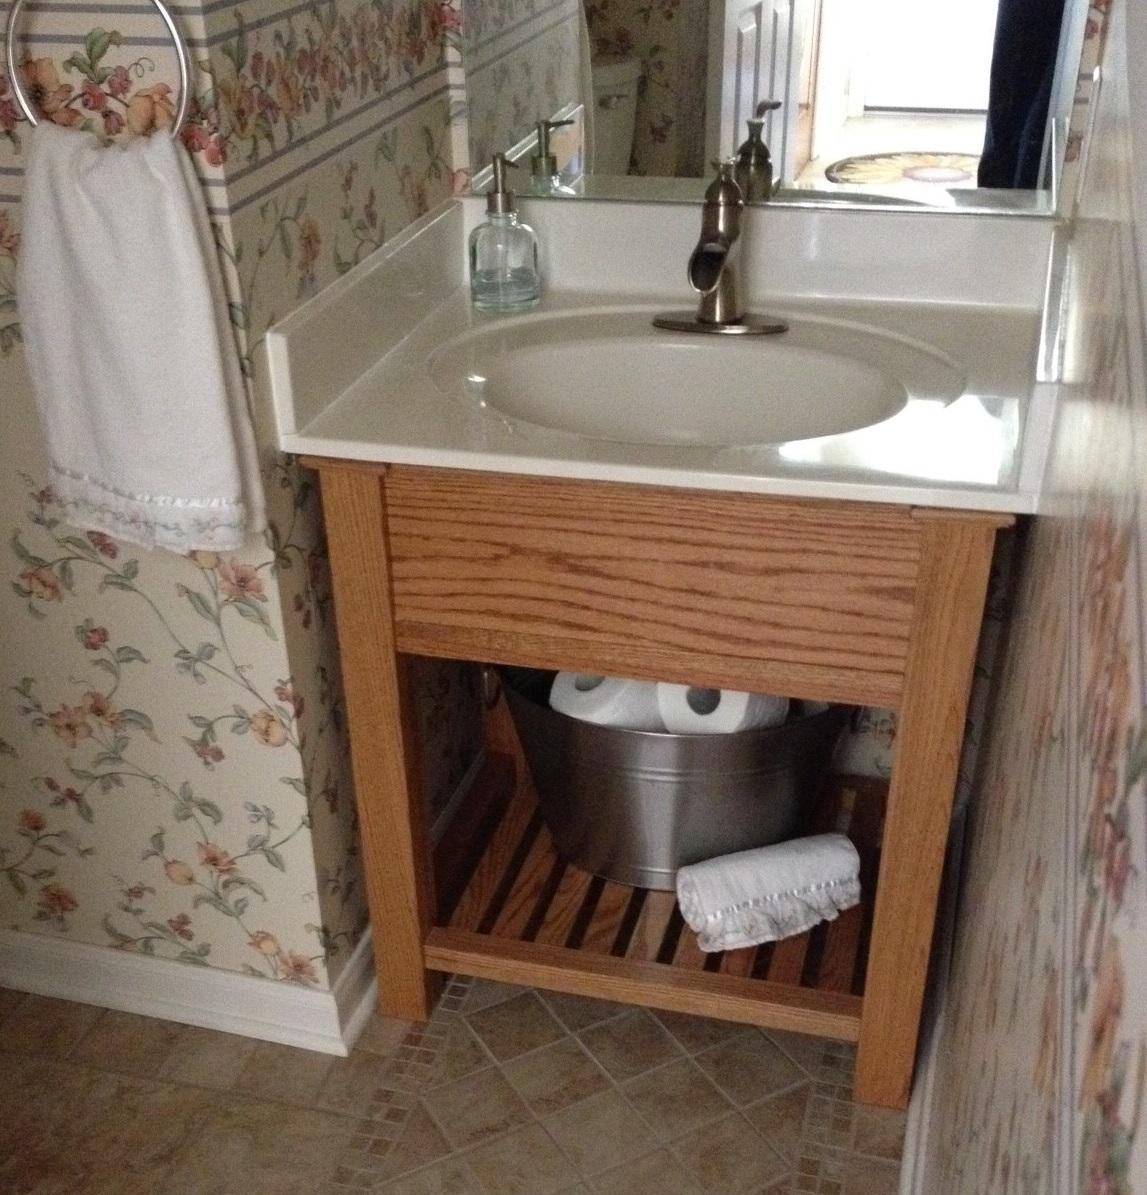 Transitional Bath Room Vanity Ana White